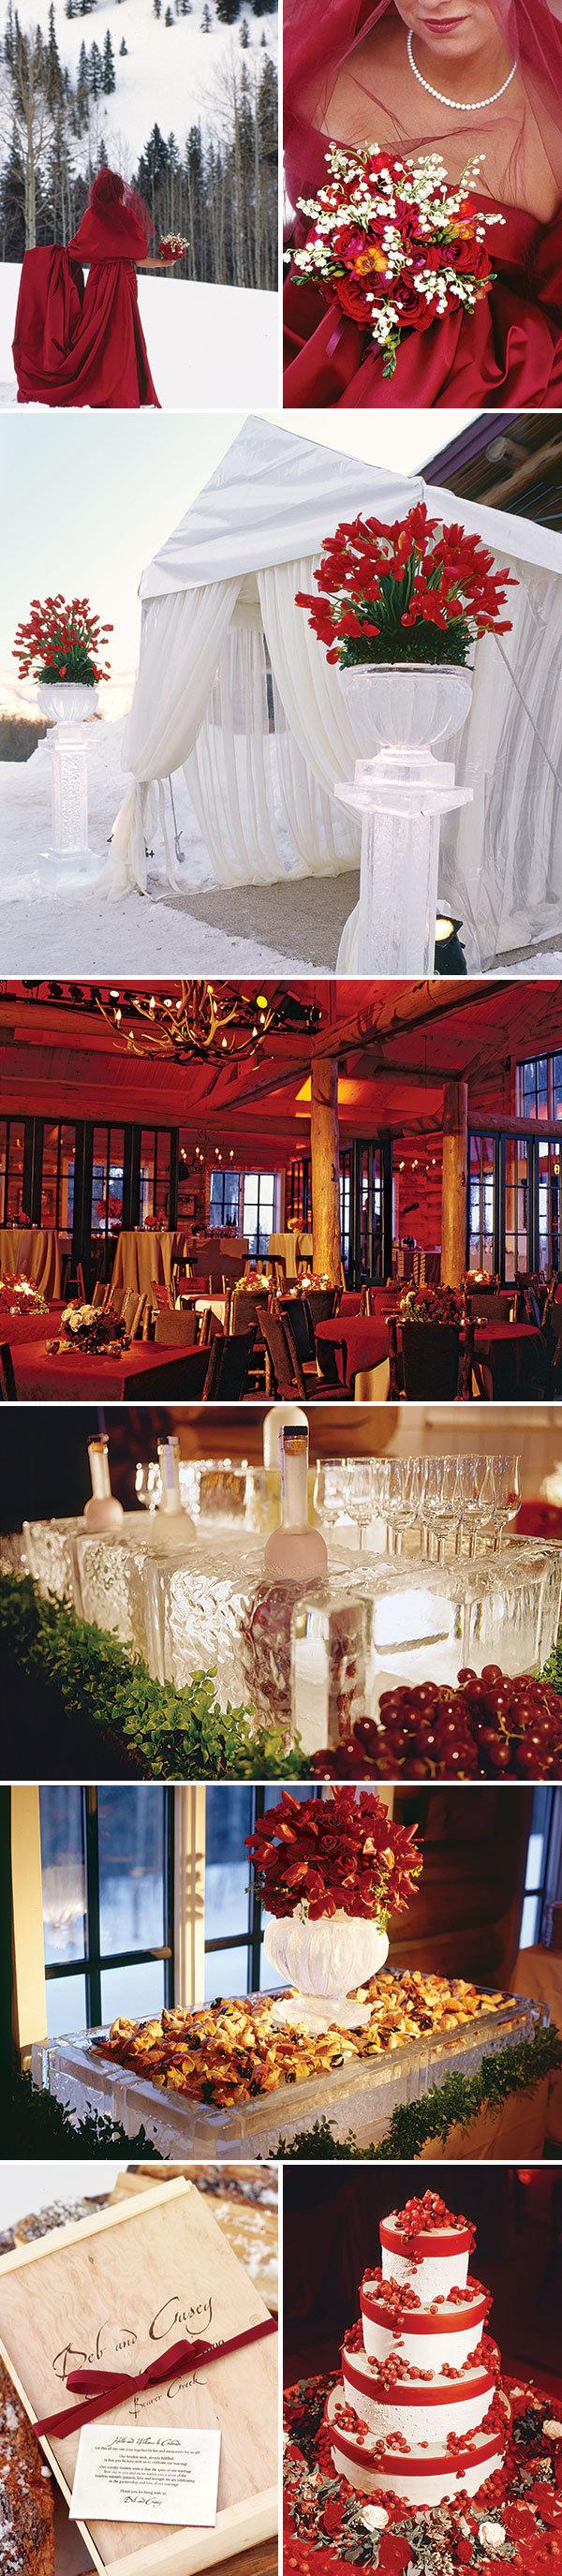 weddings planner winter reception ideas